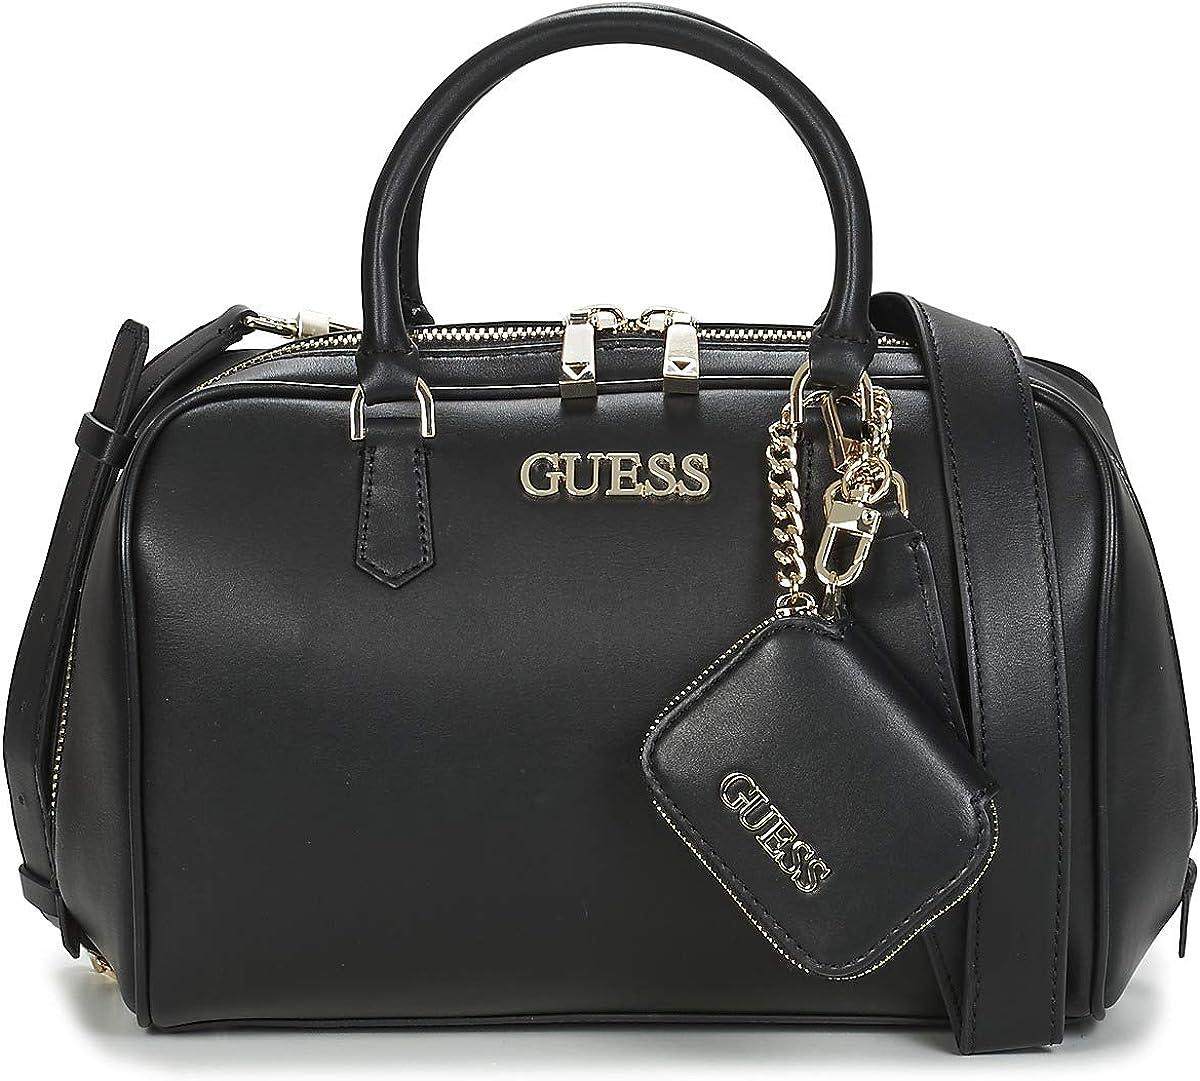 Guess sac de sacoche de bo/îte noire de calista